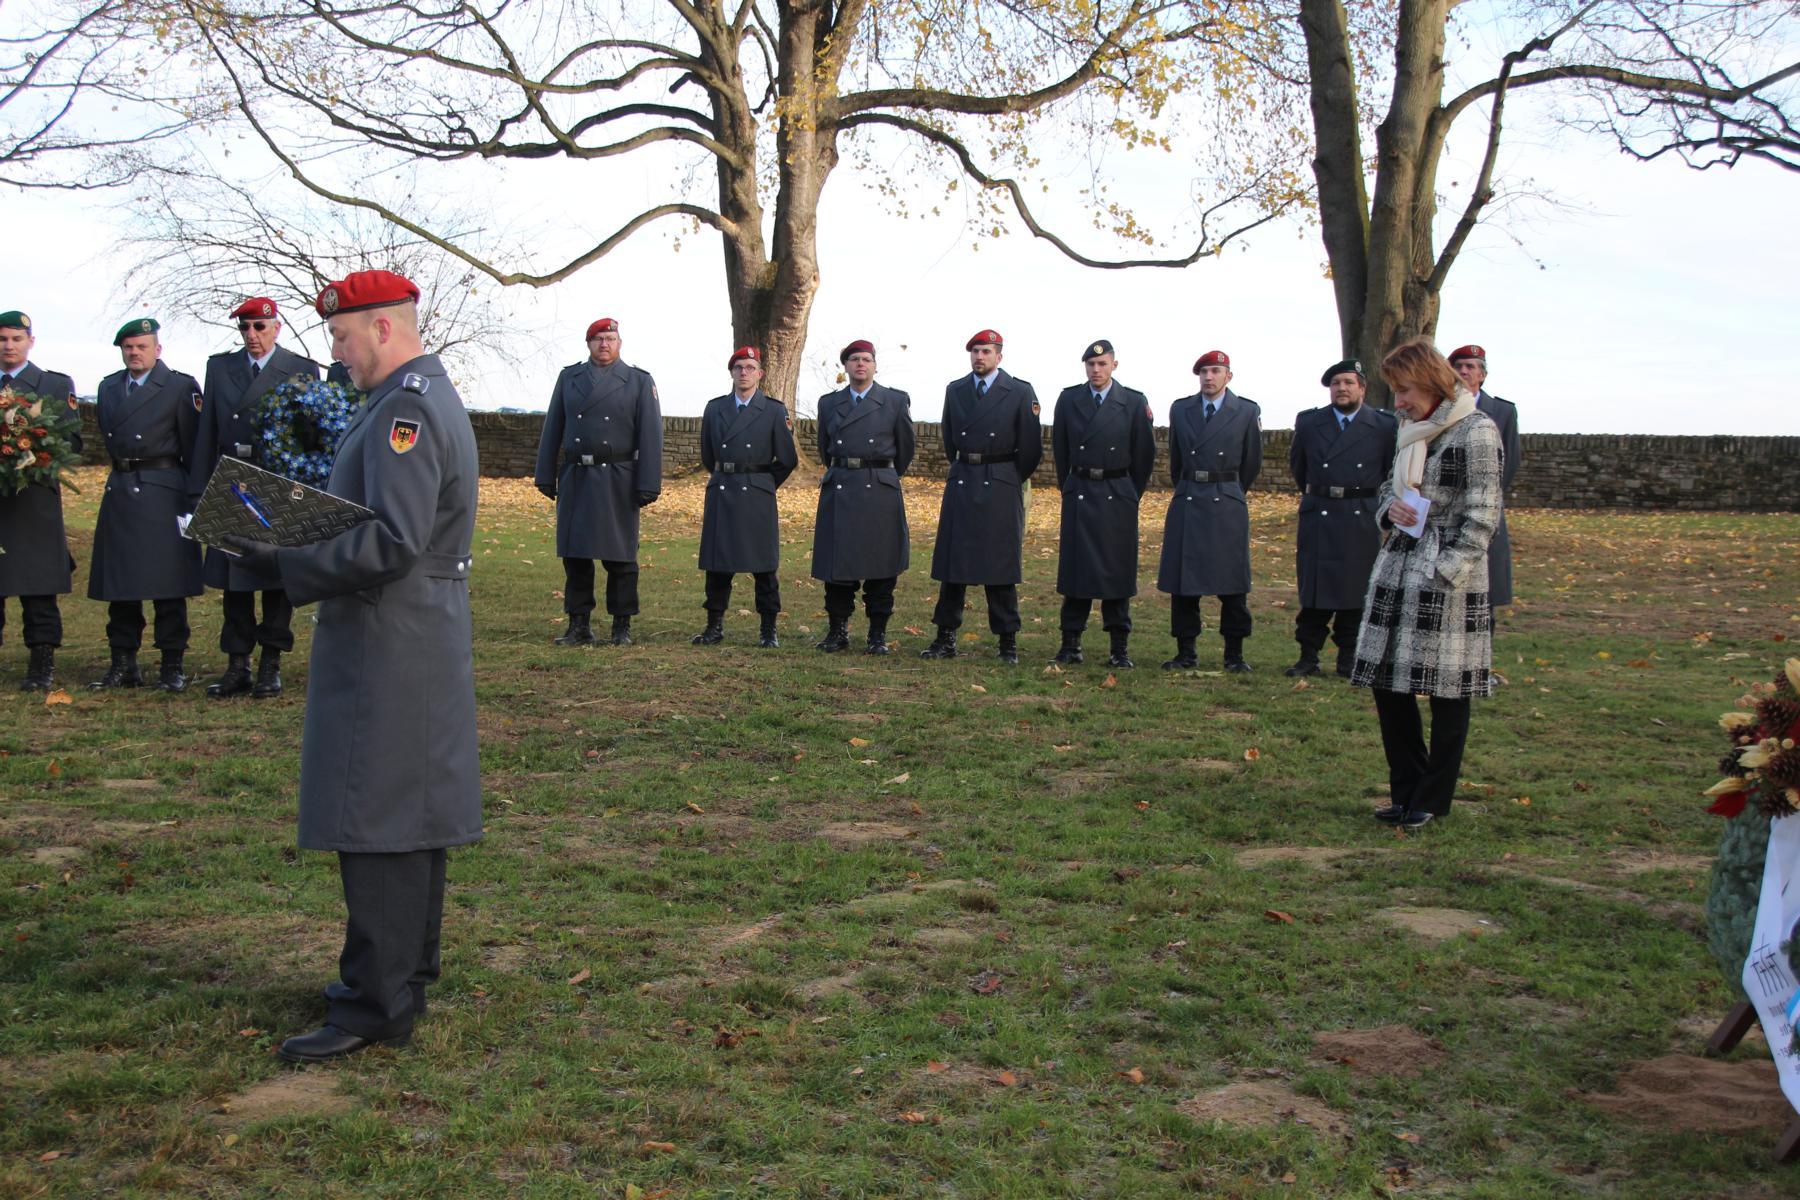 Begrüßung von OLt d.R. Valentino Lipardi - im Hintergrund: Konsulin Kupalova